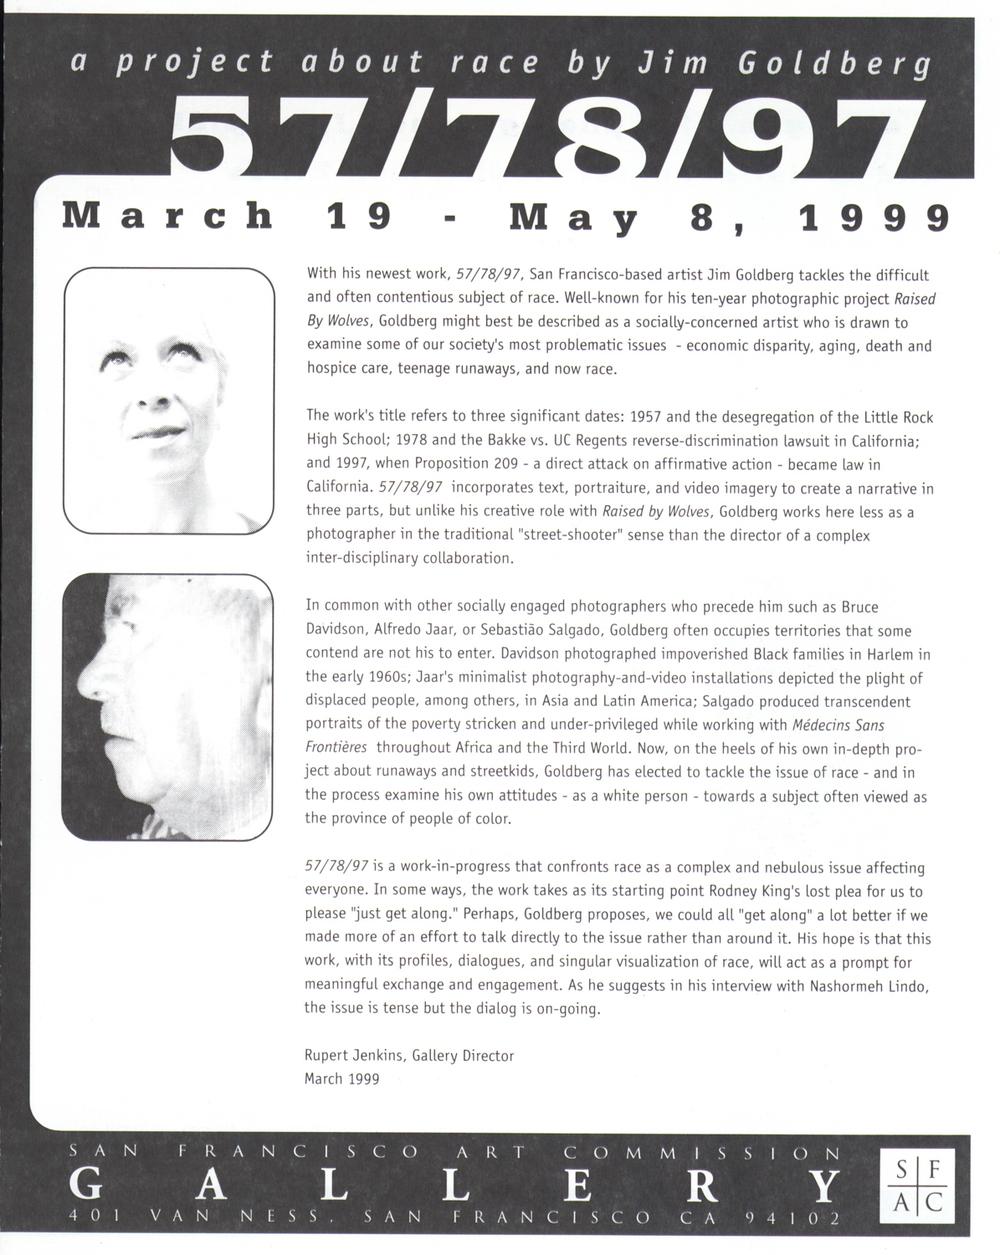 SFAC Gallery, 1999